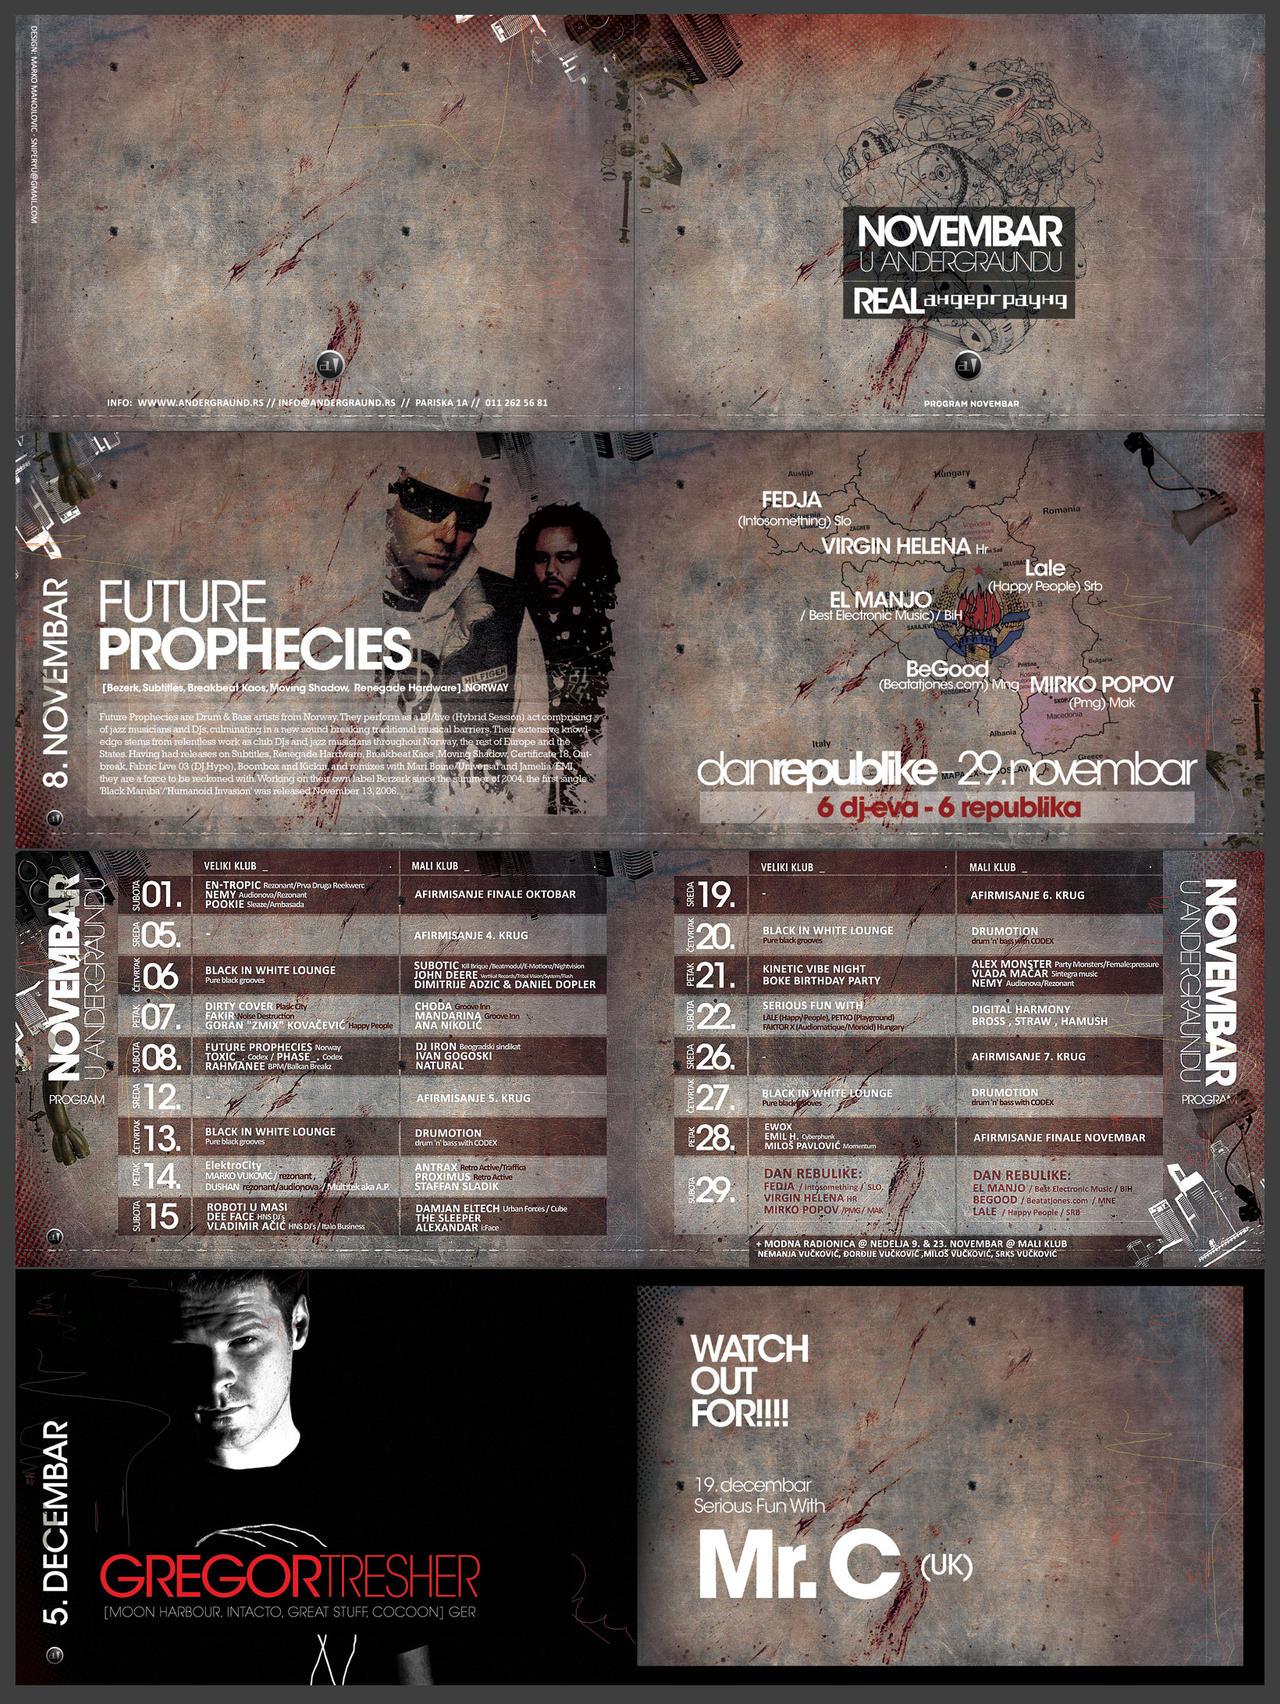 Andergraund Program Novembar by sniperyu